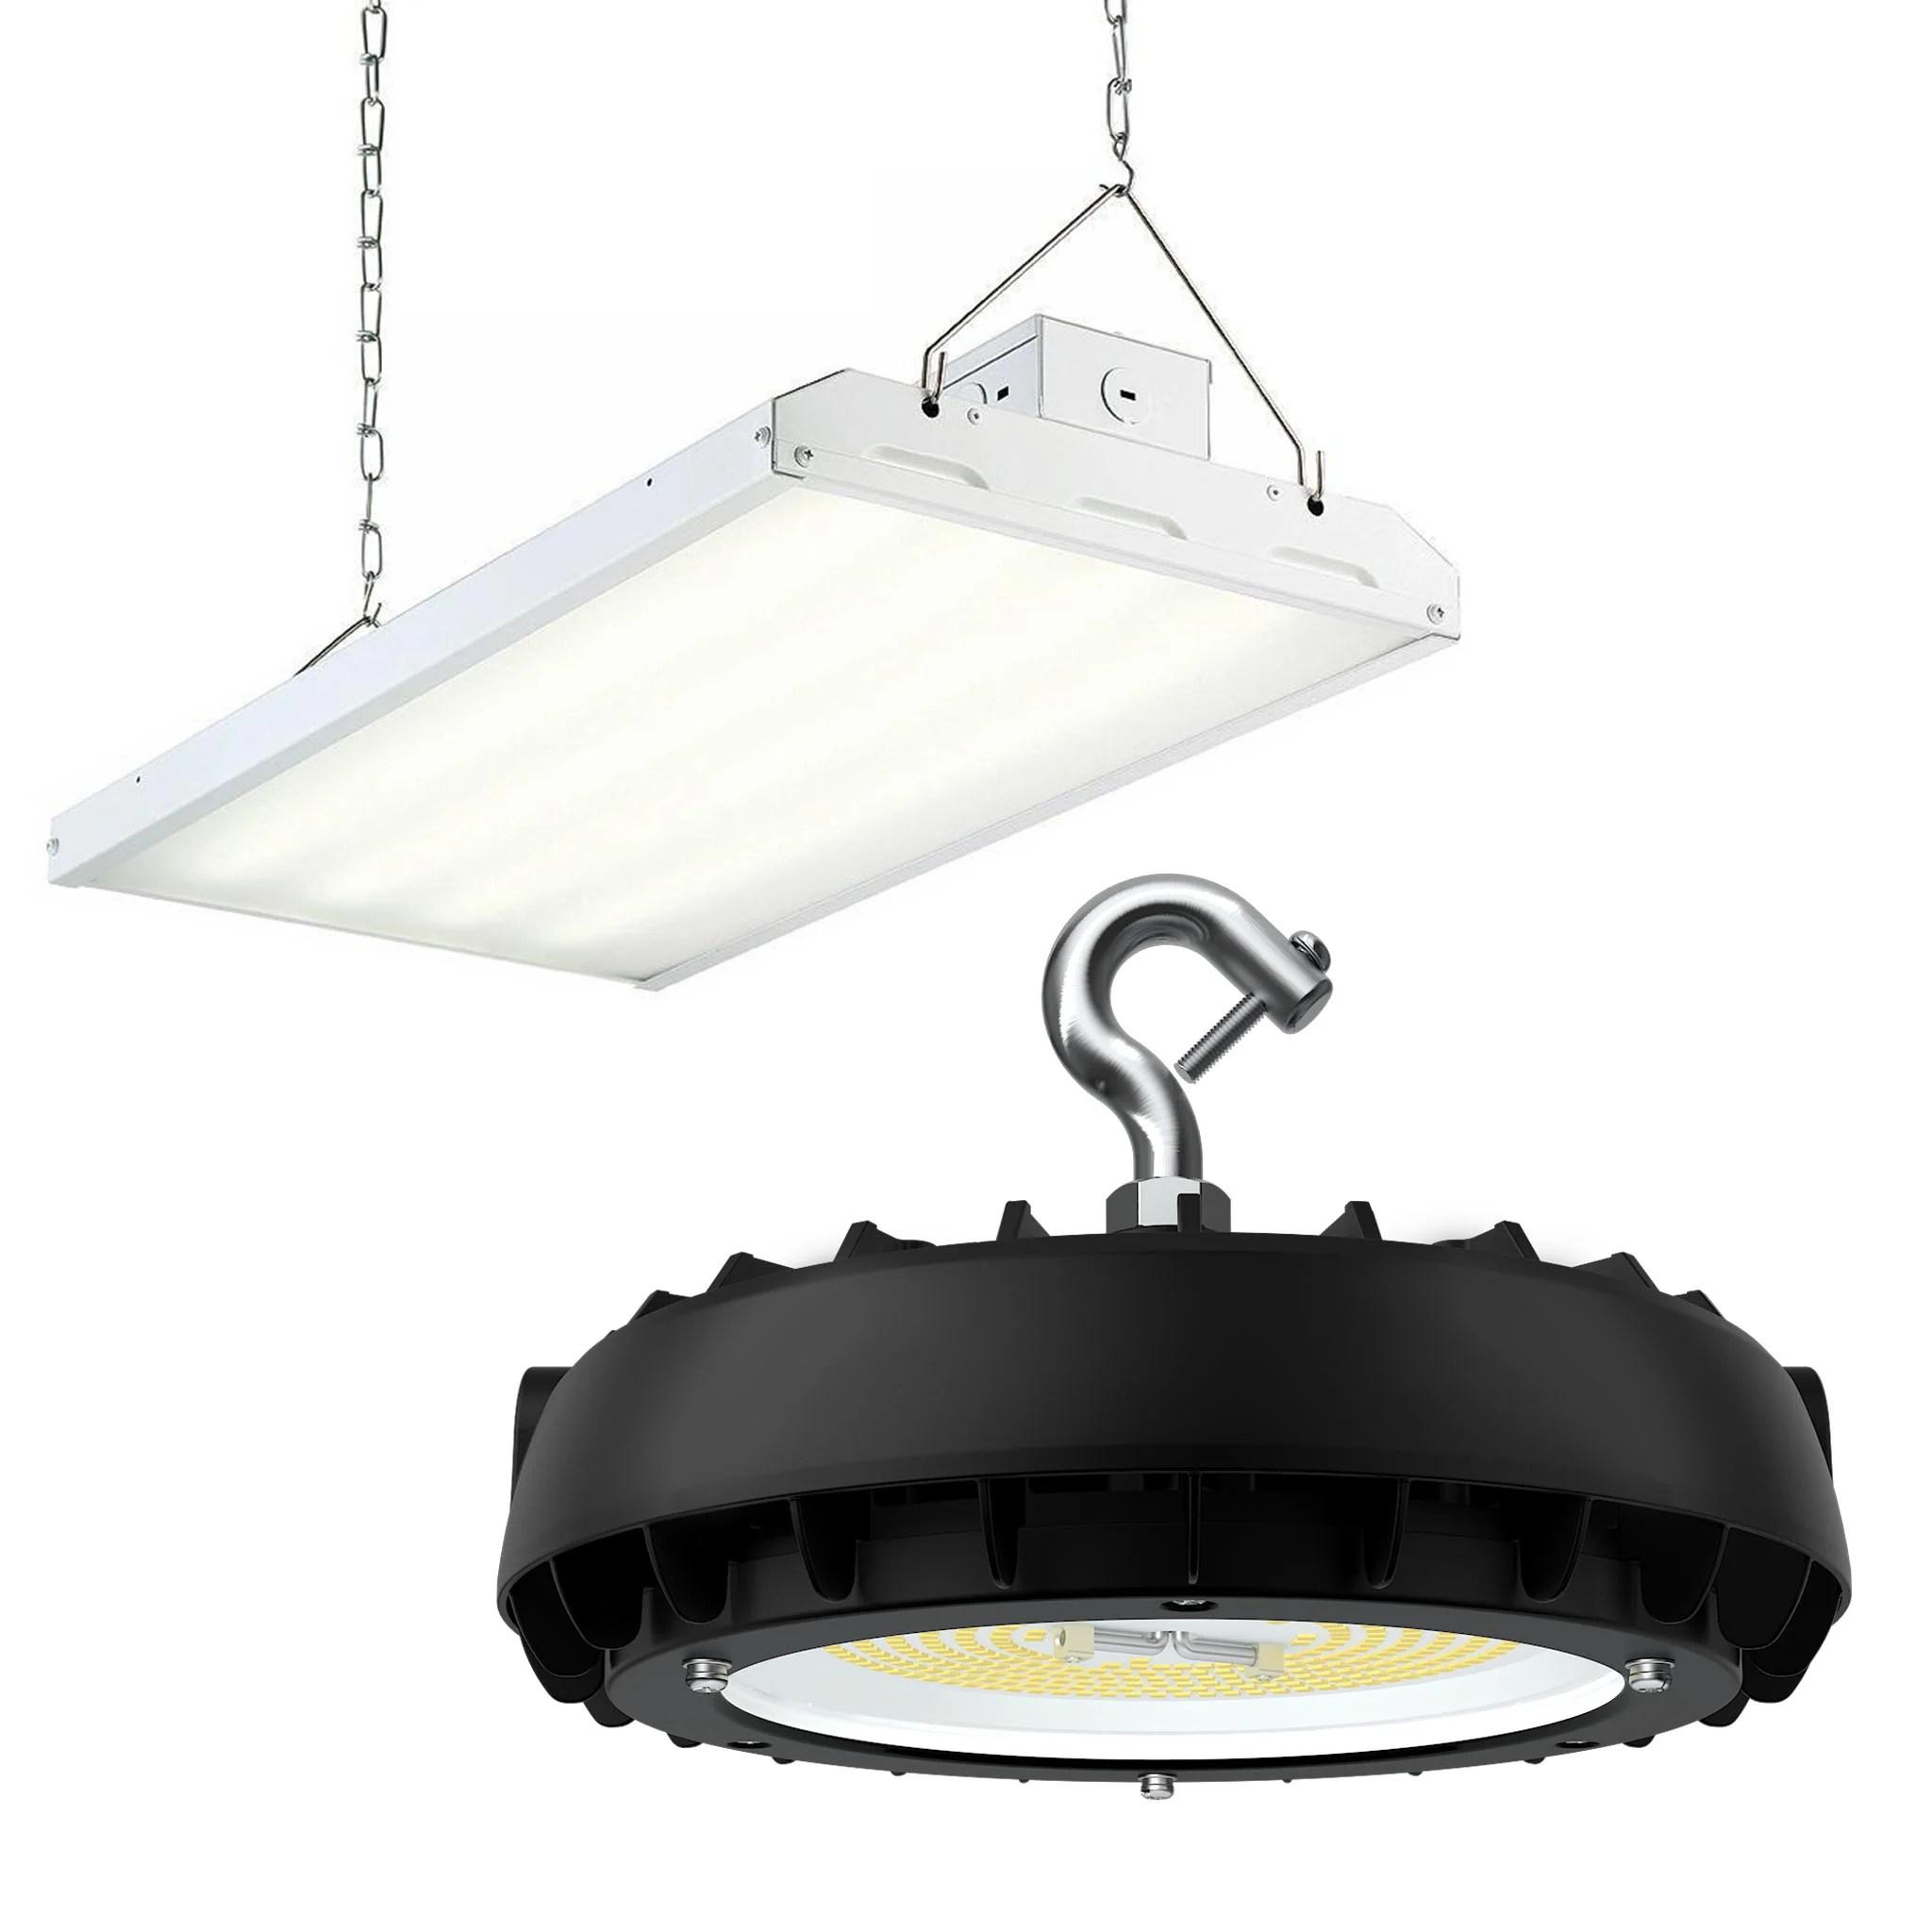 medium resolution of high bay lights lighting fixtures